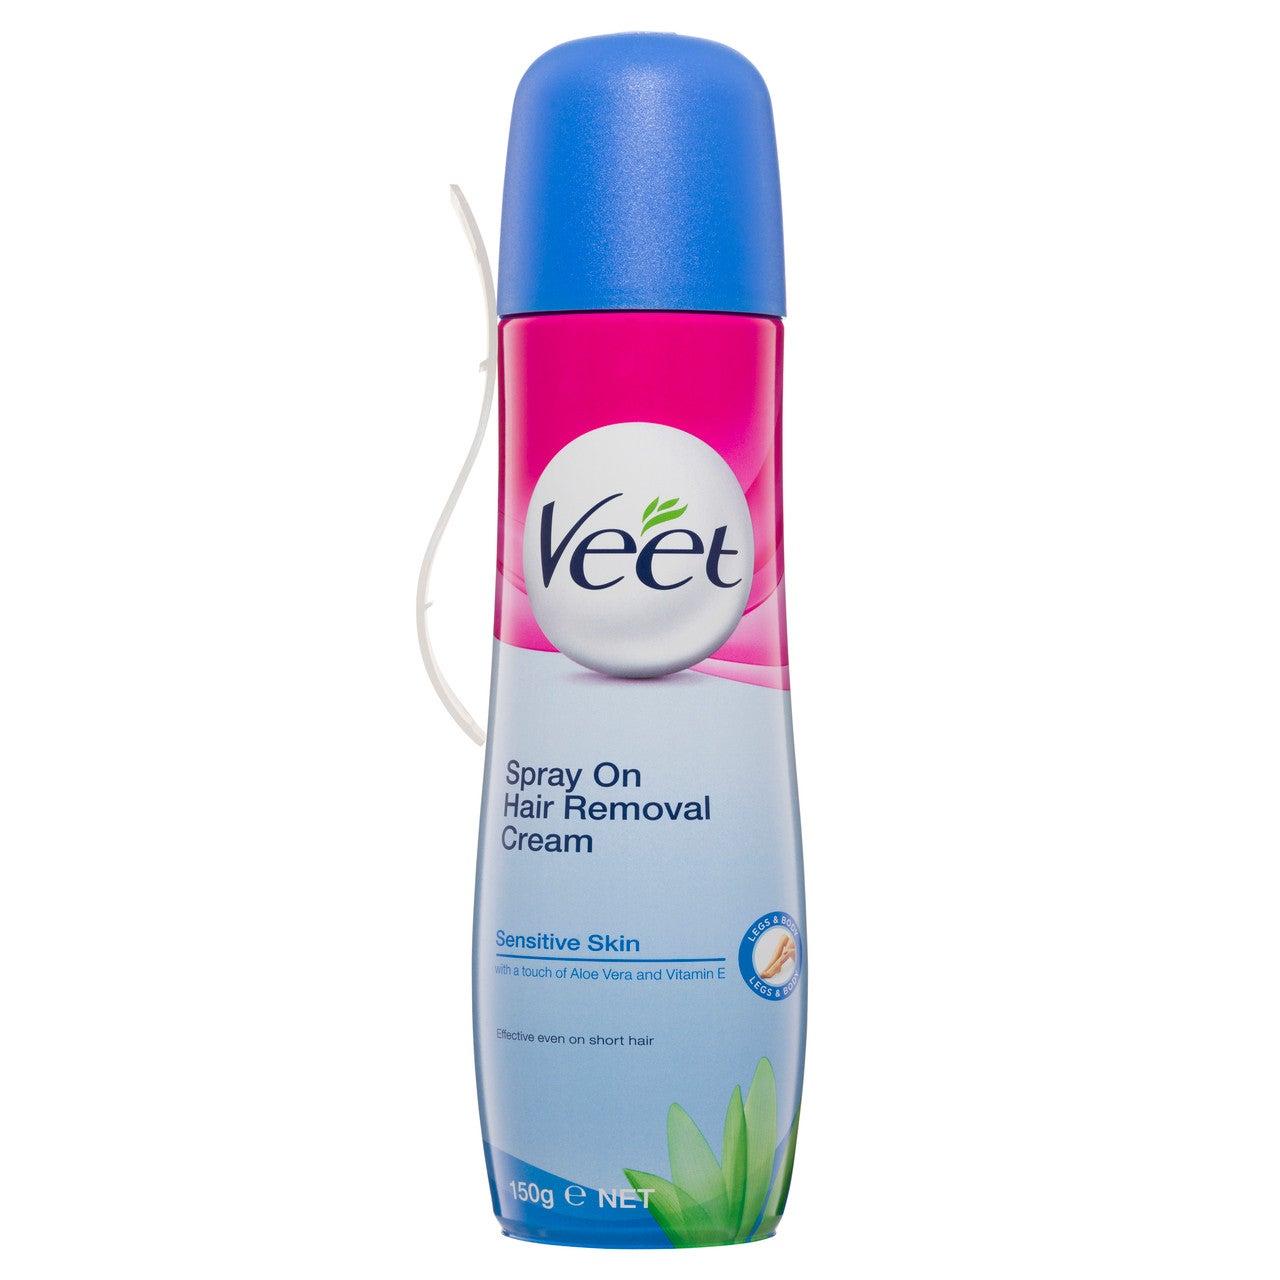 Veet Spray On Cream 150ml Sensitive